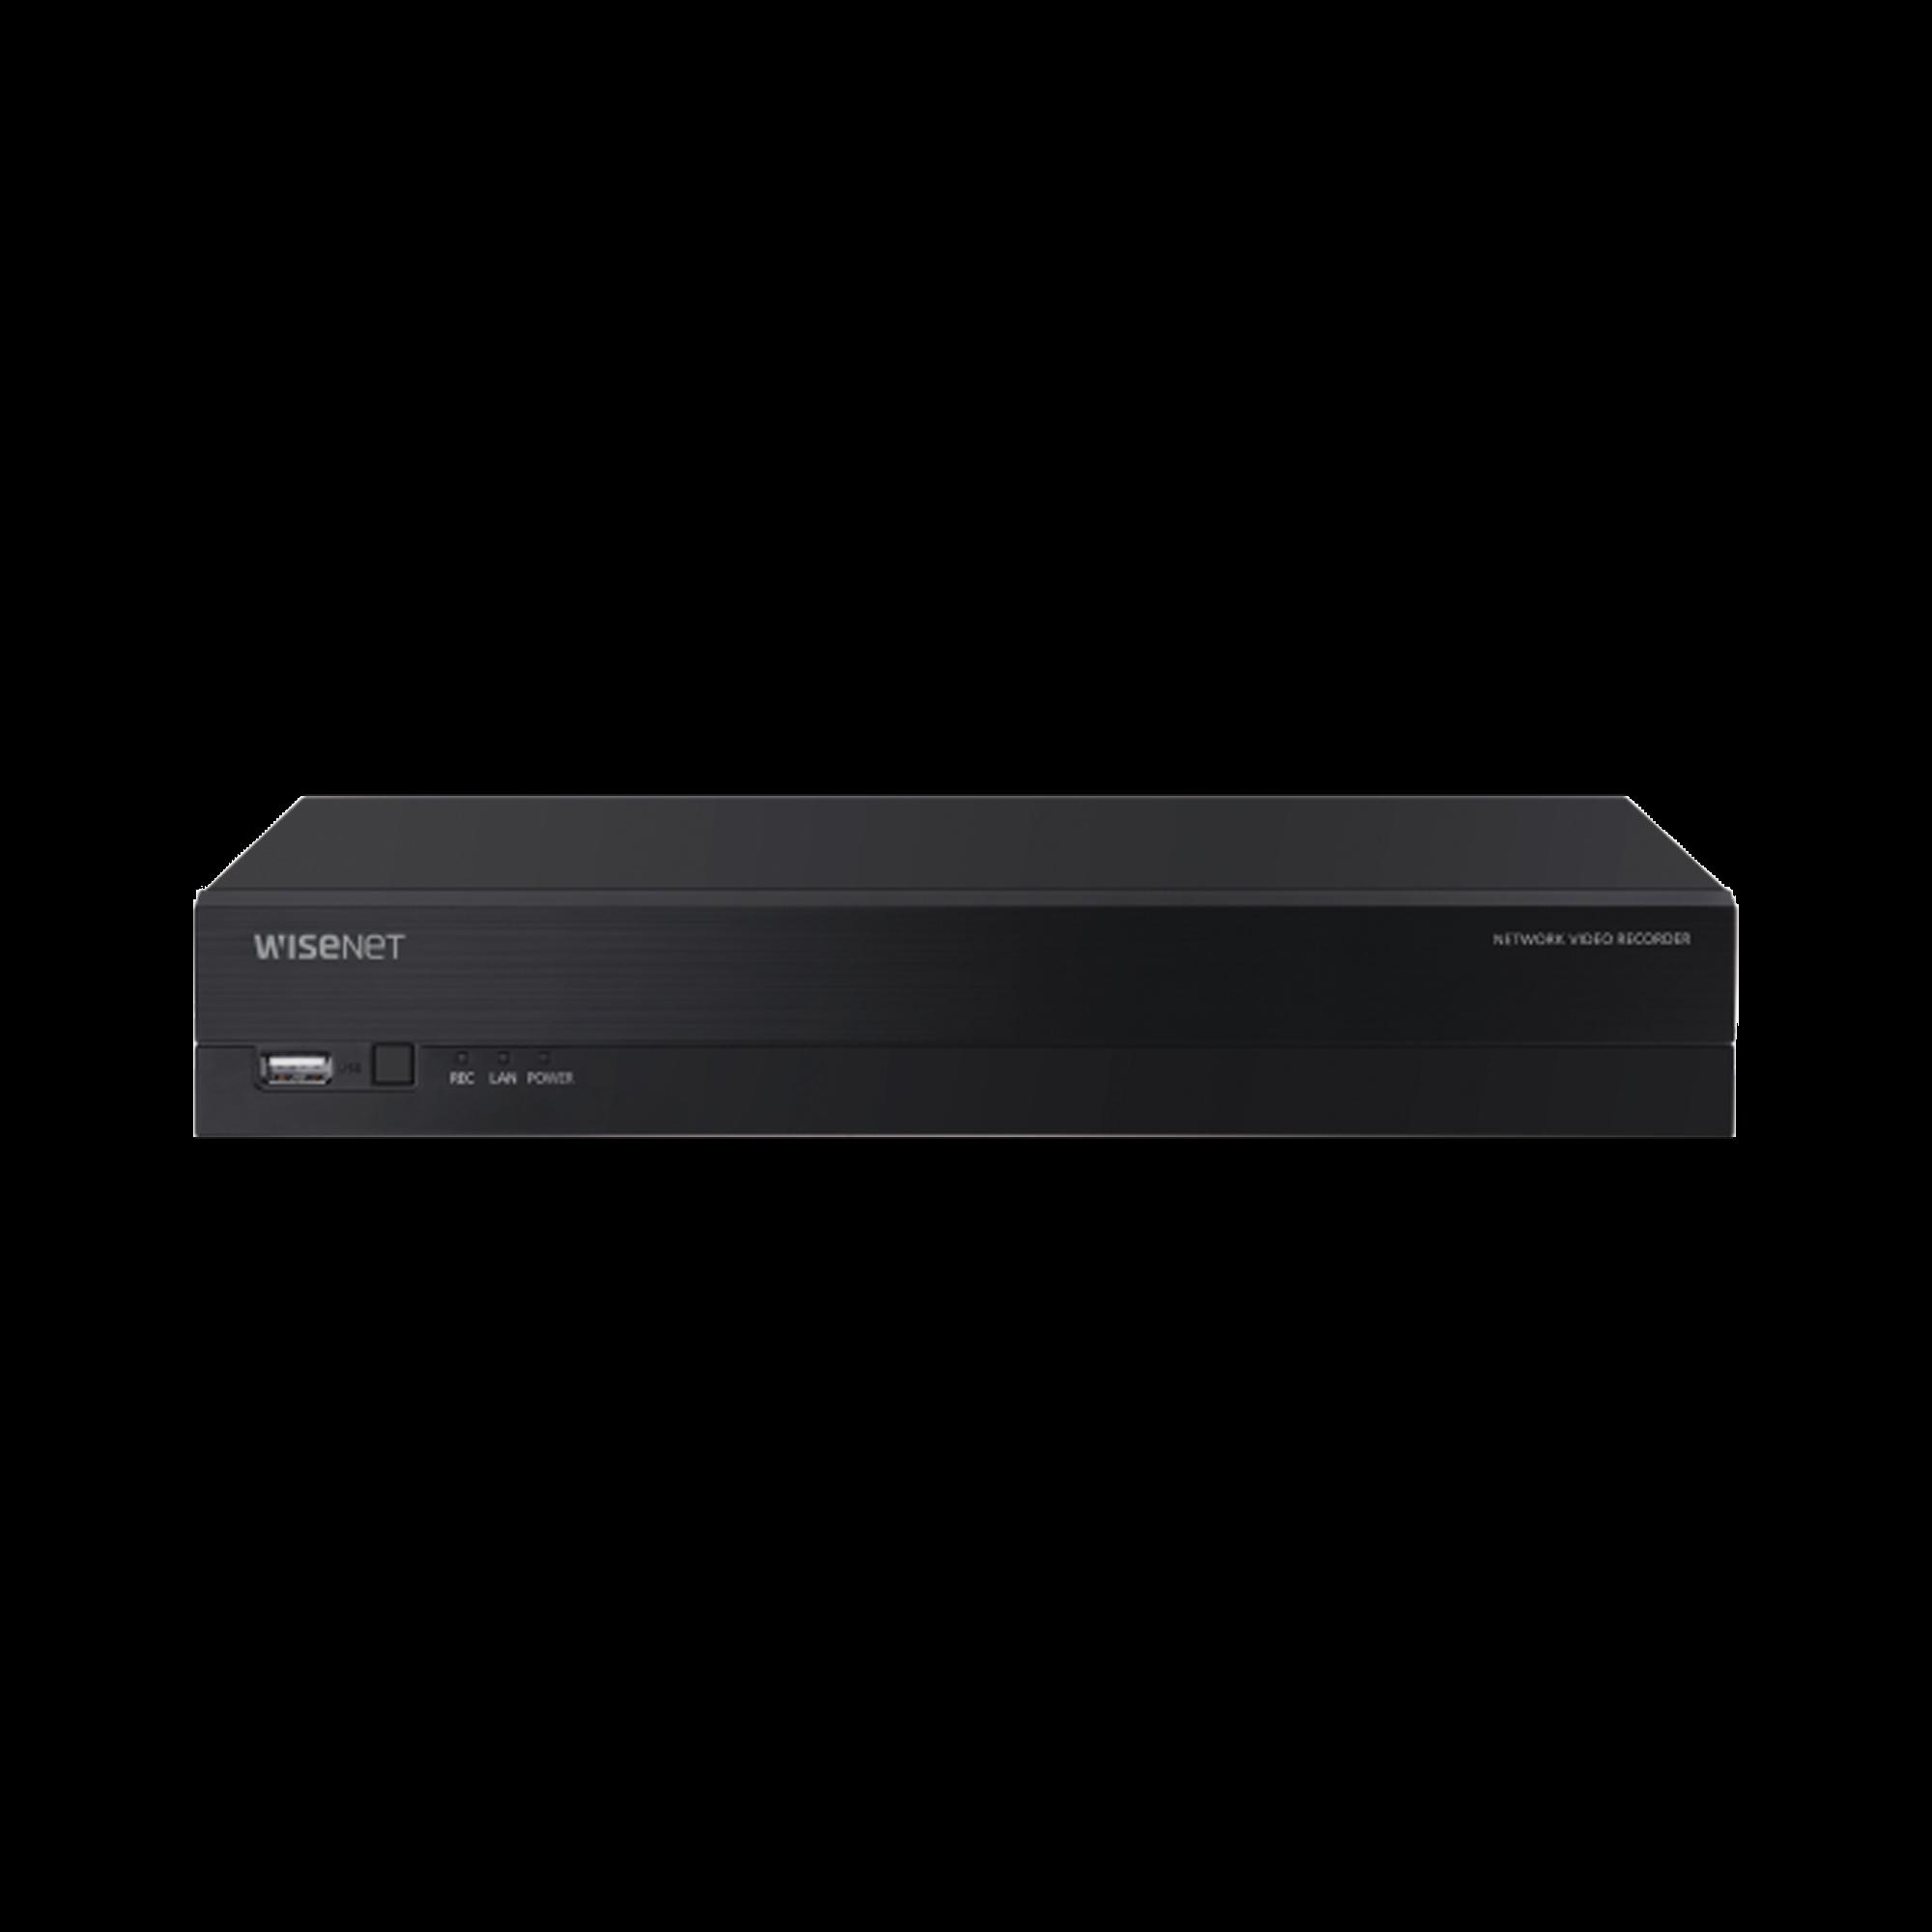 NVR 8 Megapixel / 8 canales / H.265 / P2P Wisenet / 8 puertos PoE